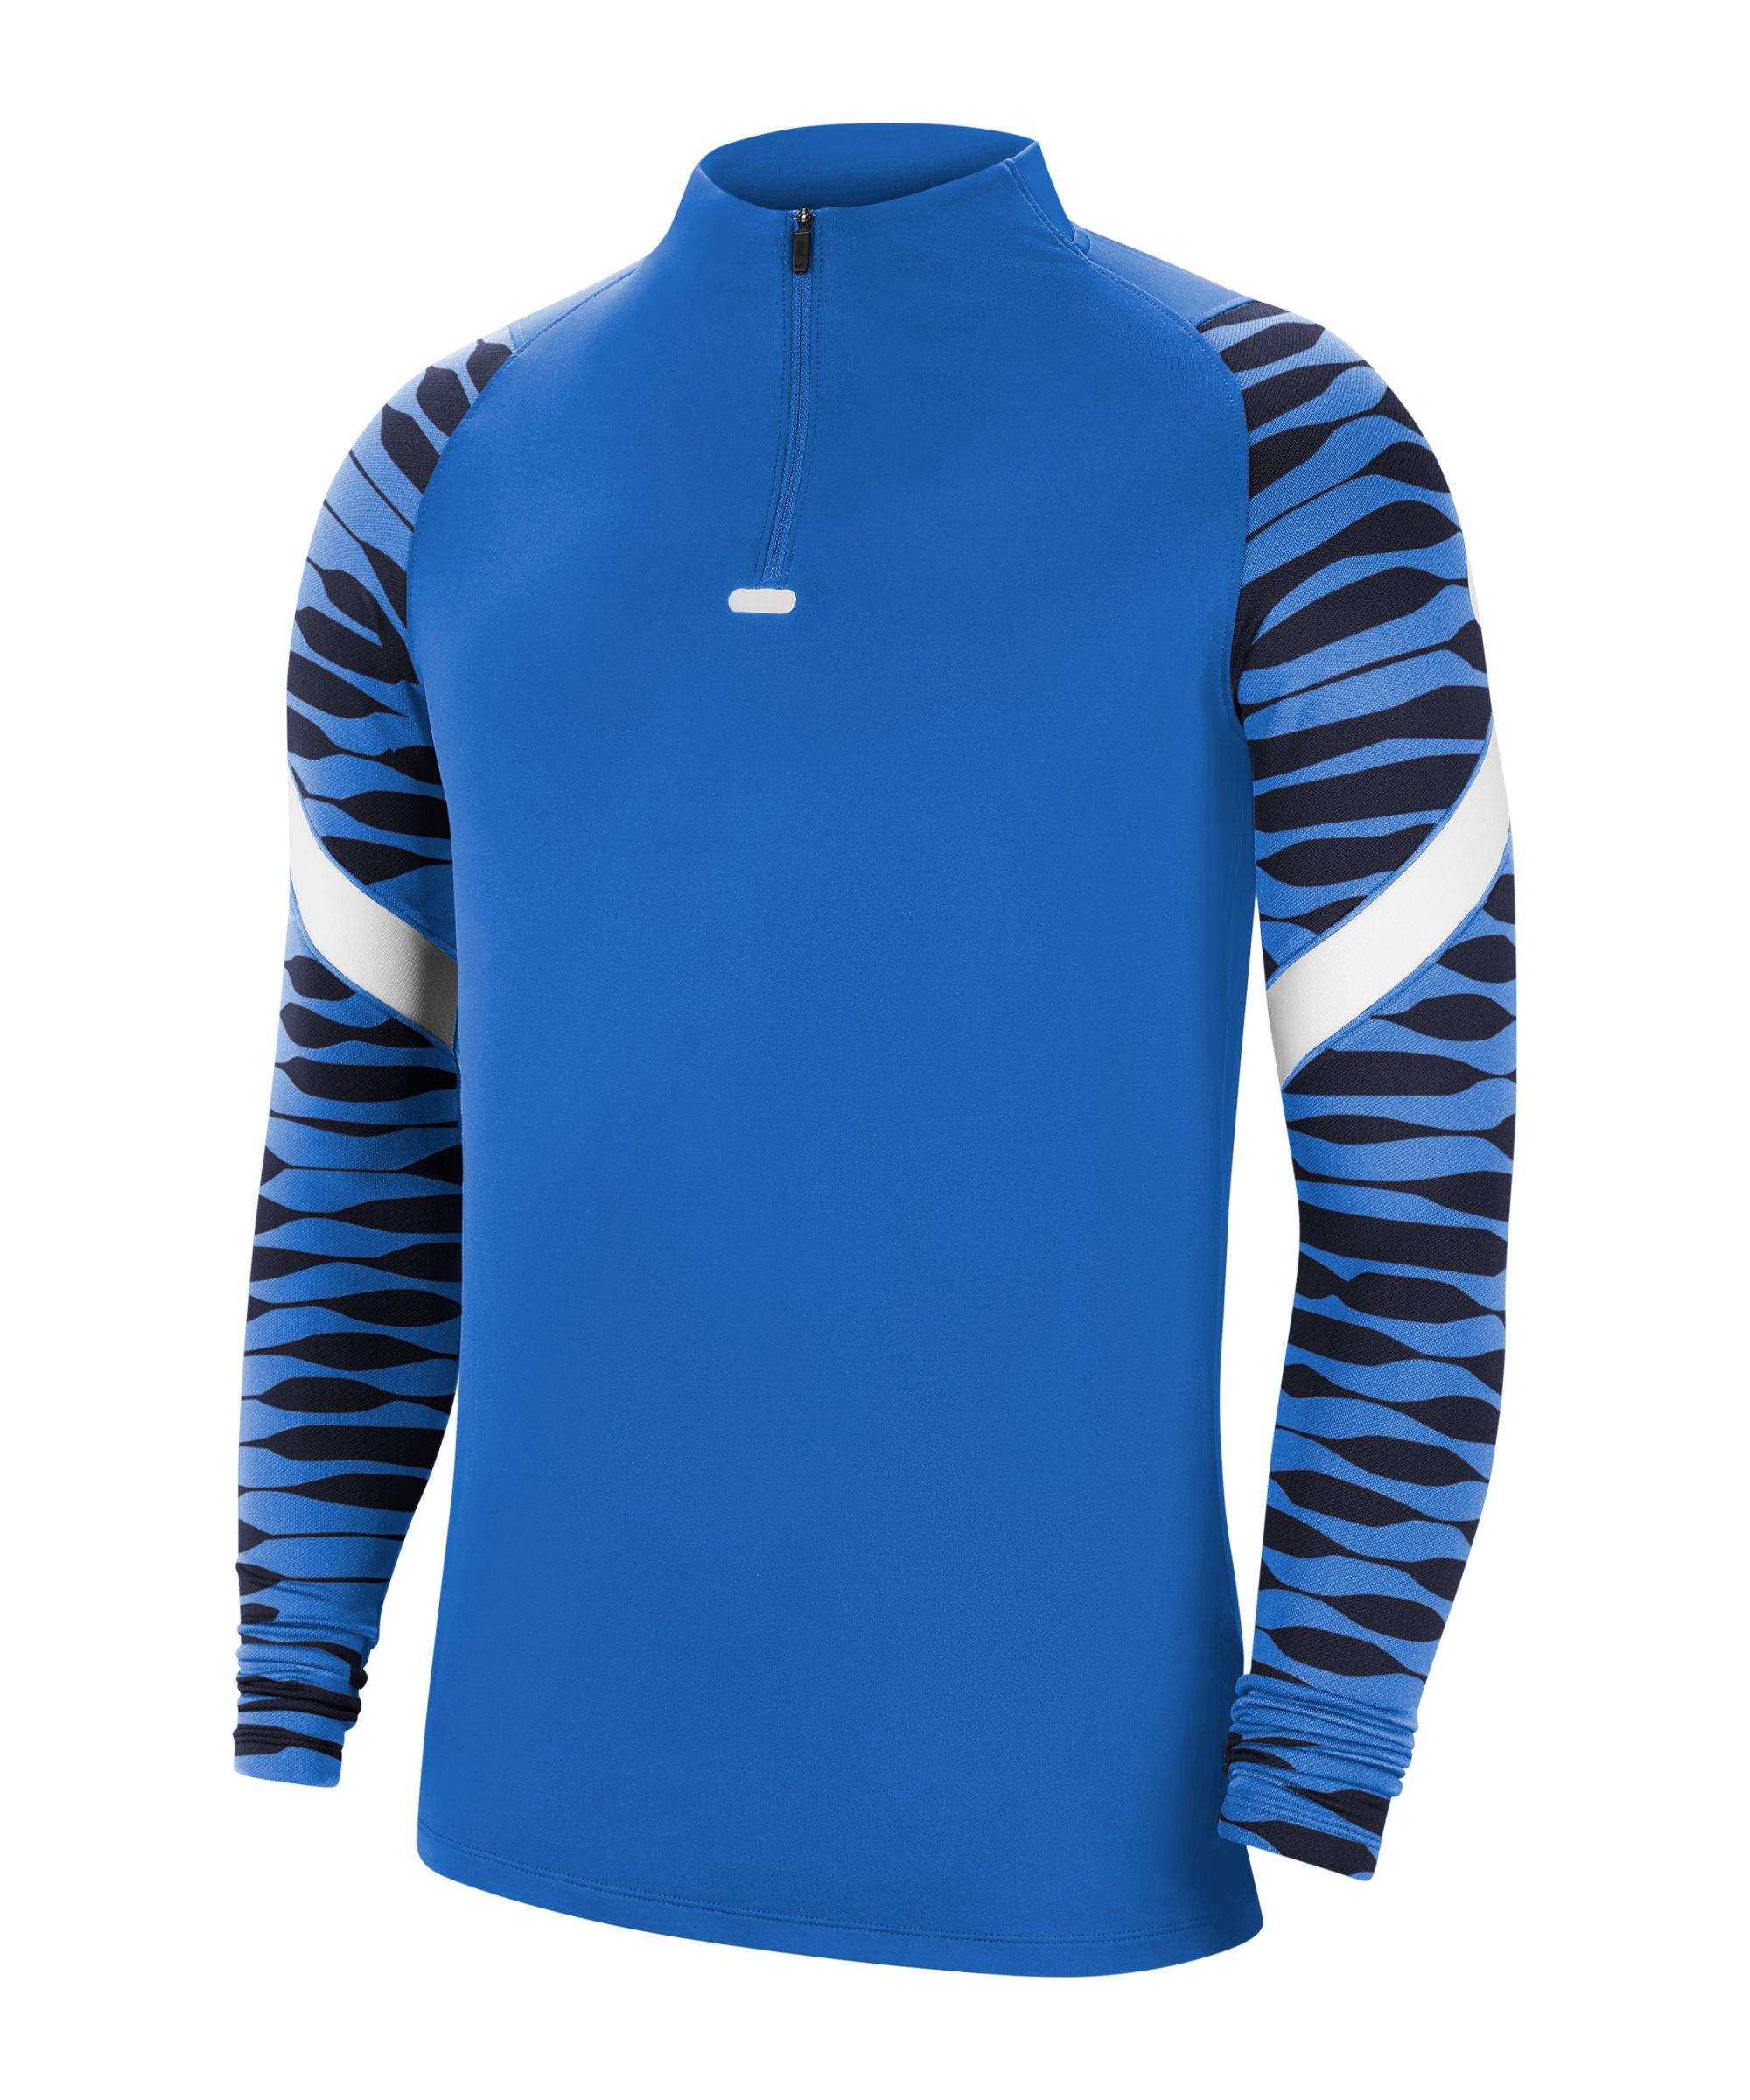 Nike Strike 21 Drill Top Blau Weiss F463 - blau